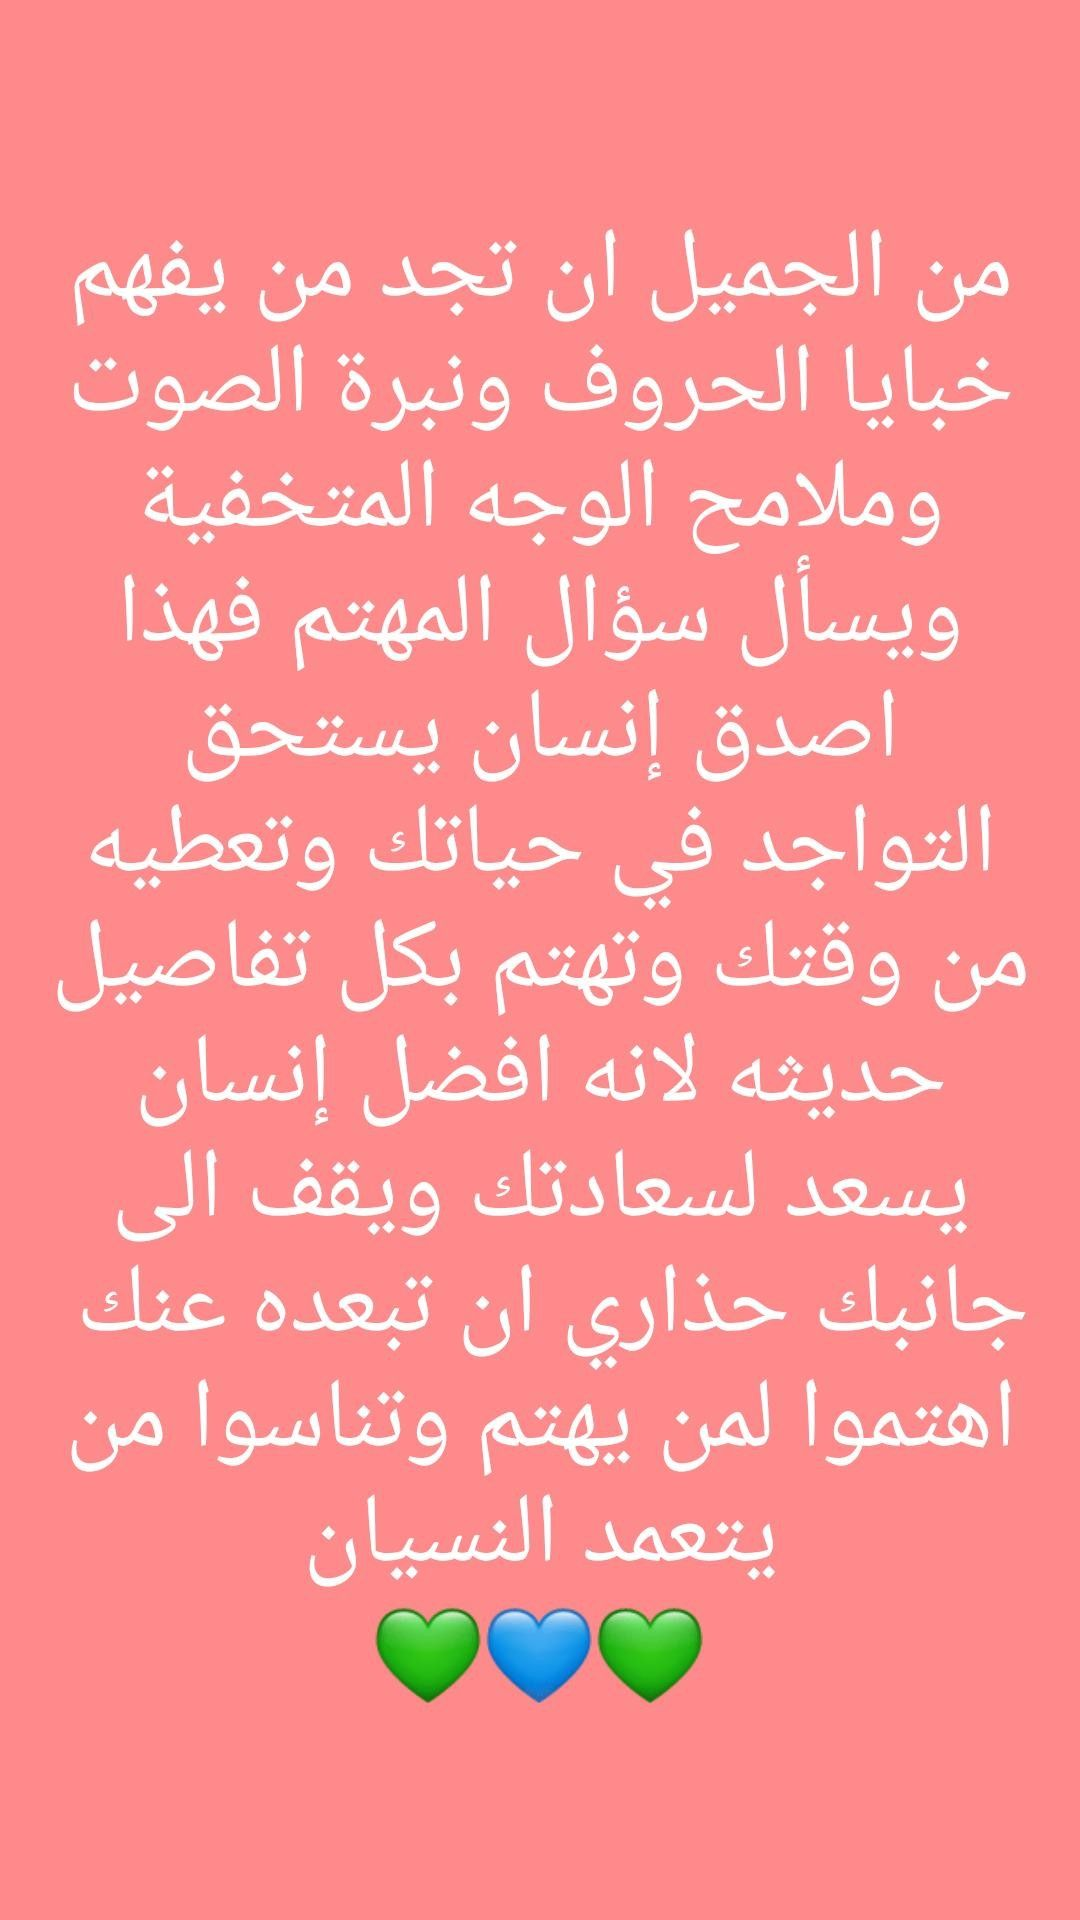 Pin By Lyan Hitham On خواطر Calligraphy Arabic Calligraphy Diy